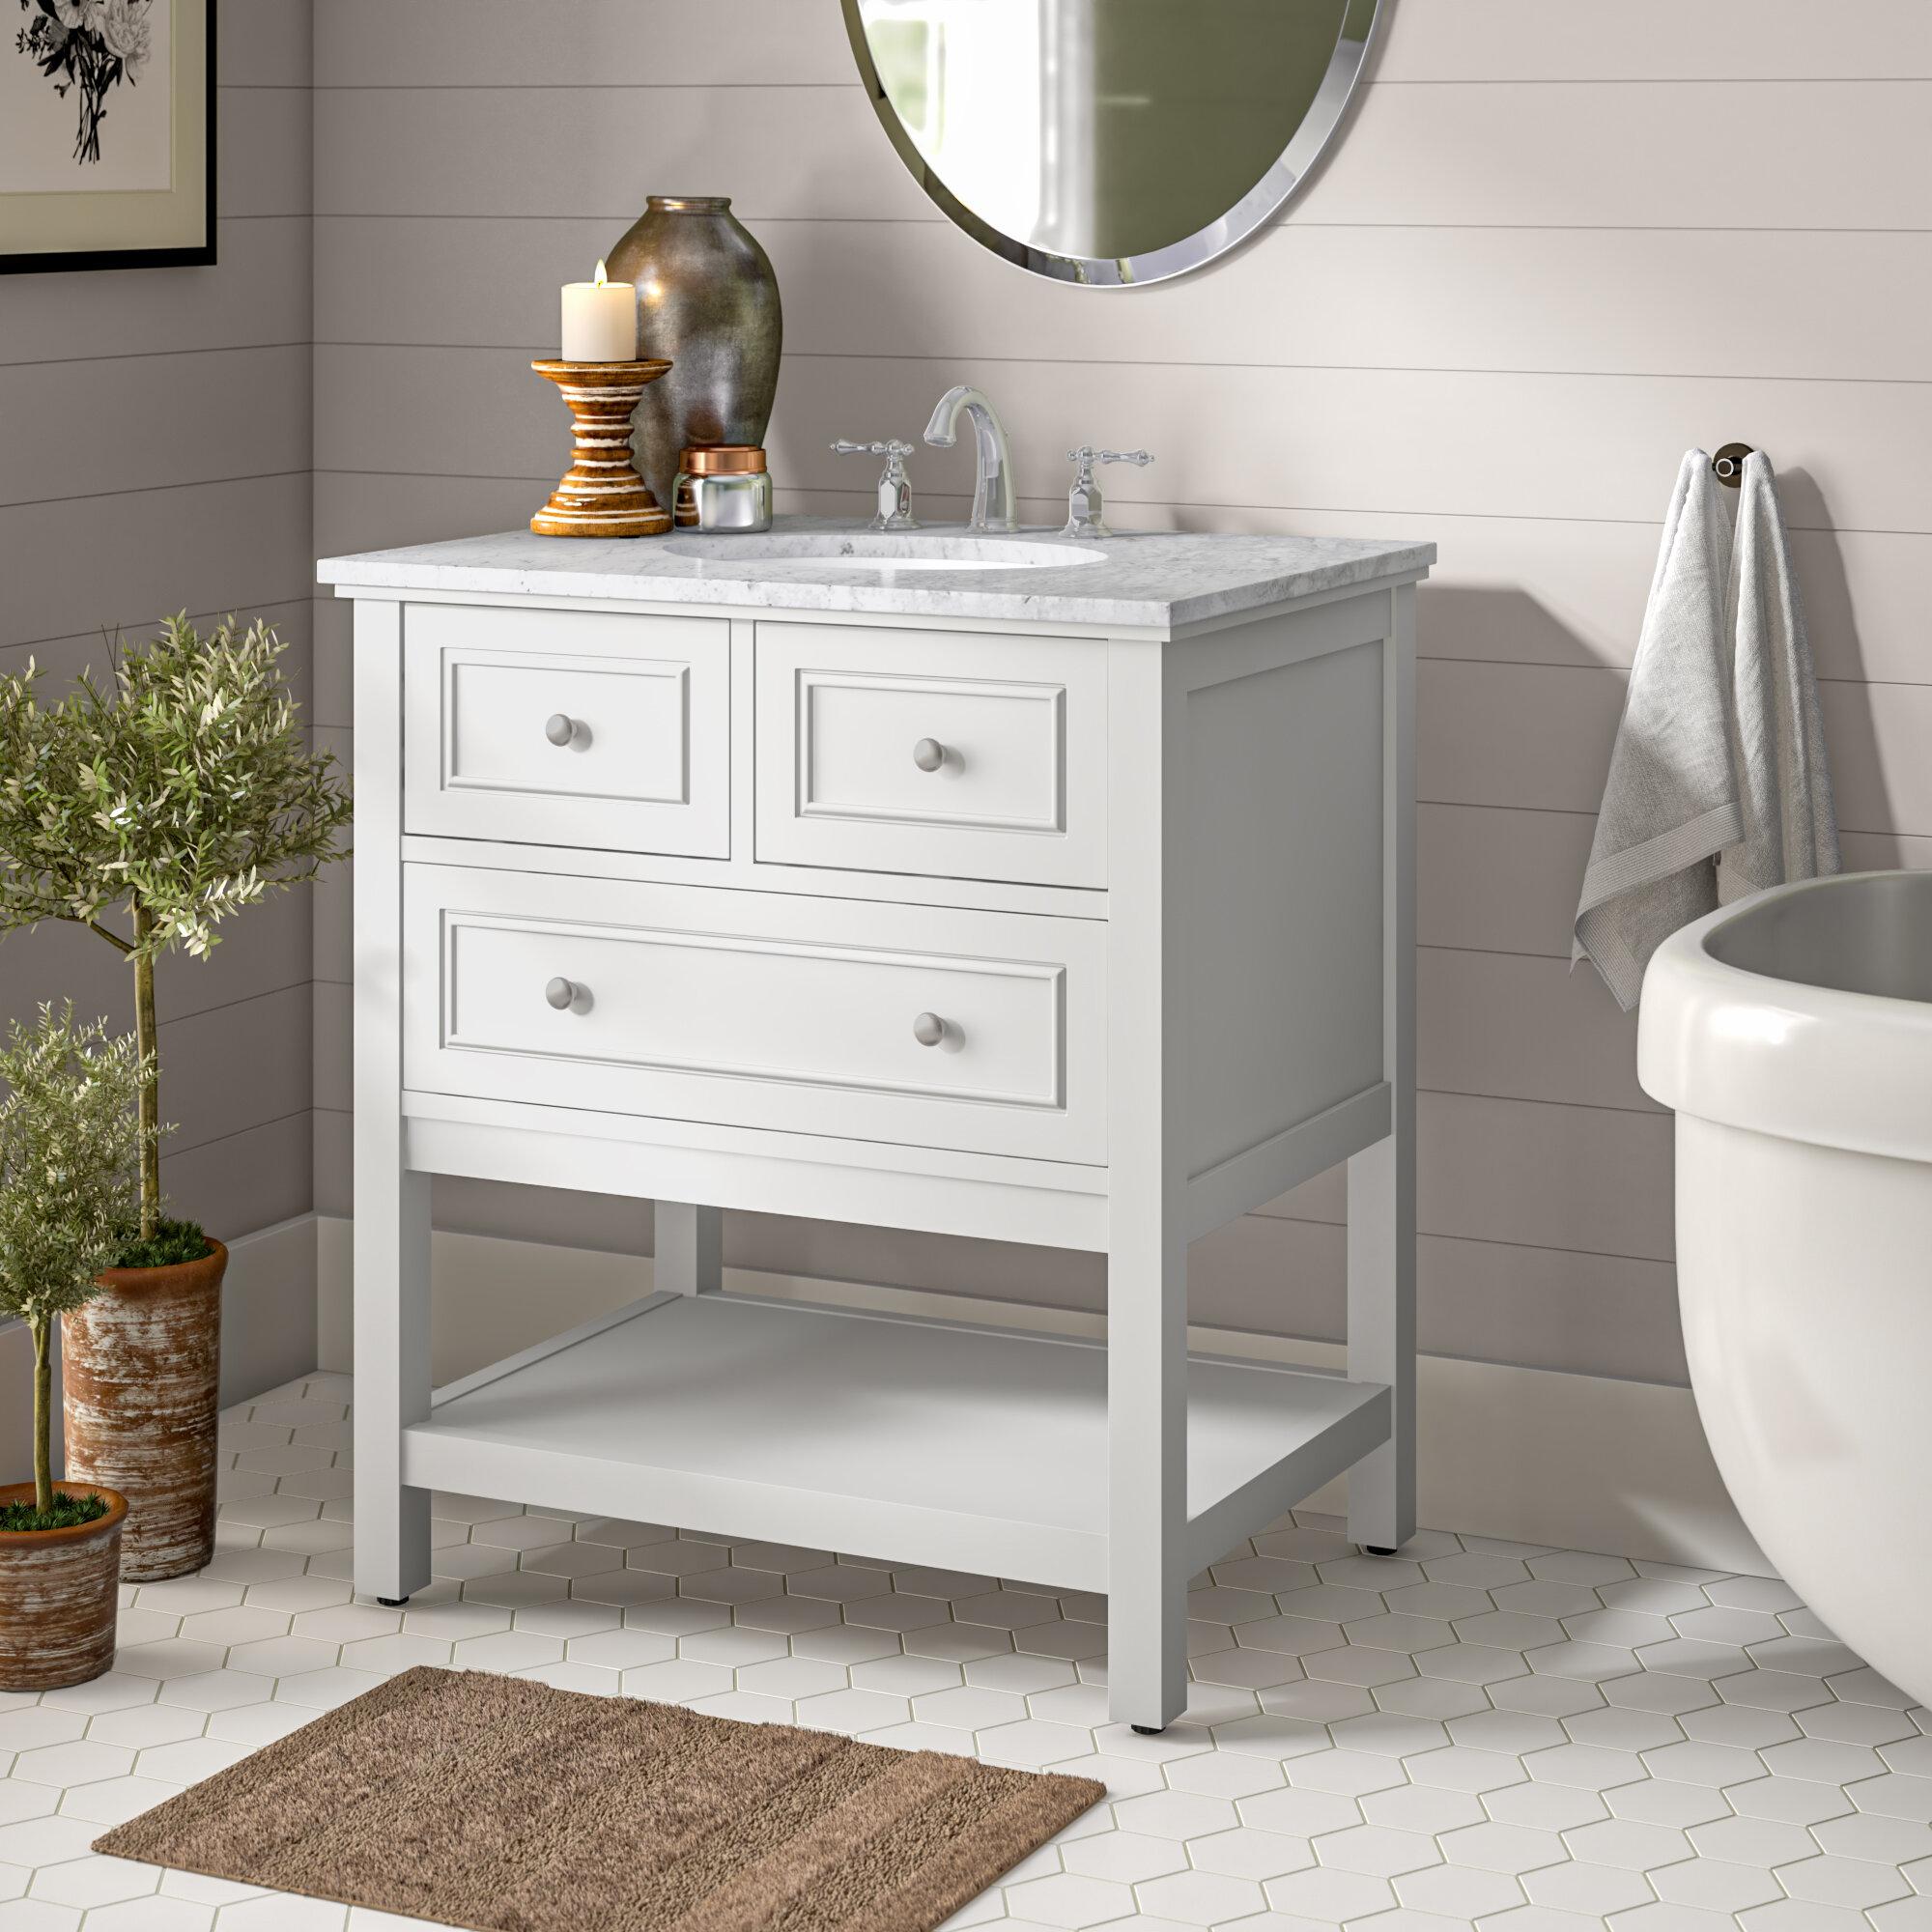 Charlton Home Trimble 30 Single Bathroom Vanity Set Reviews Wayfair